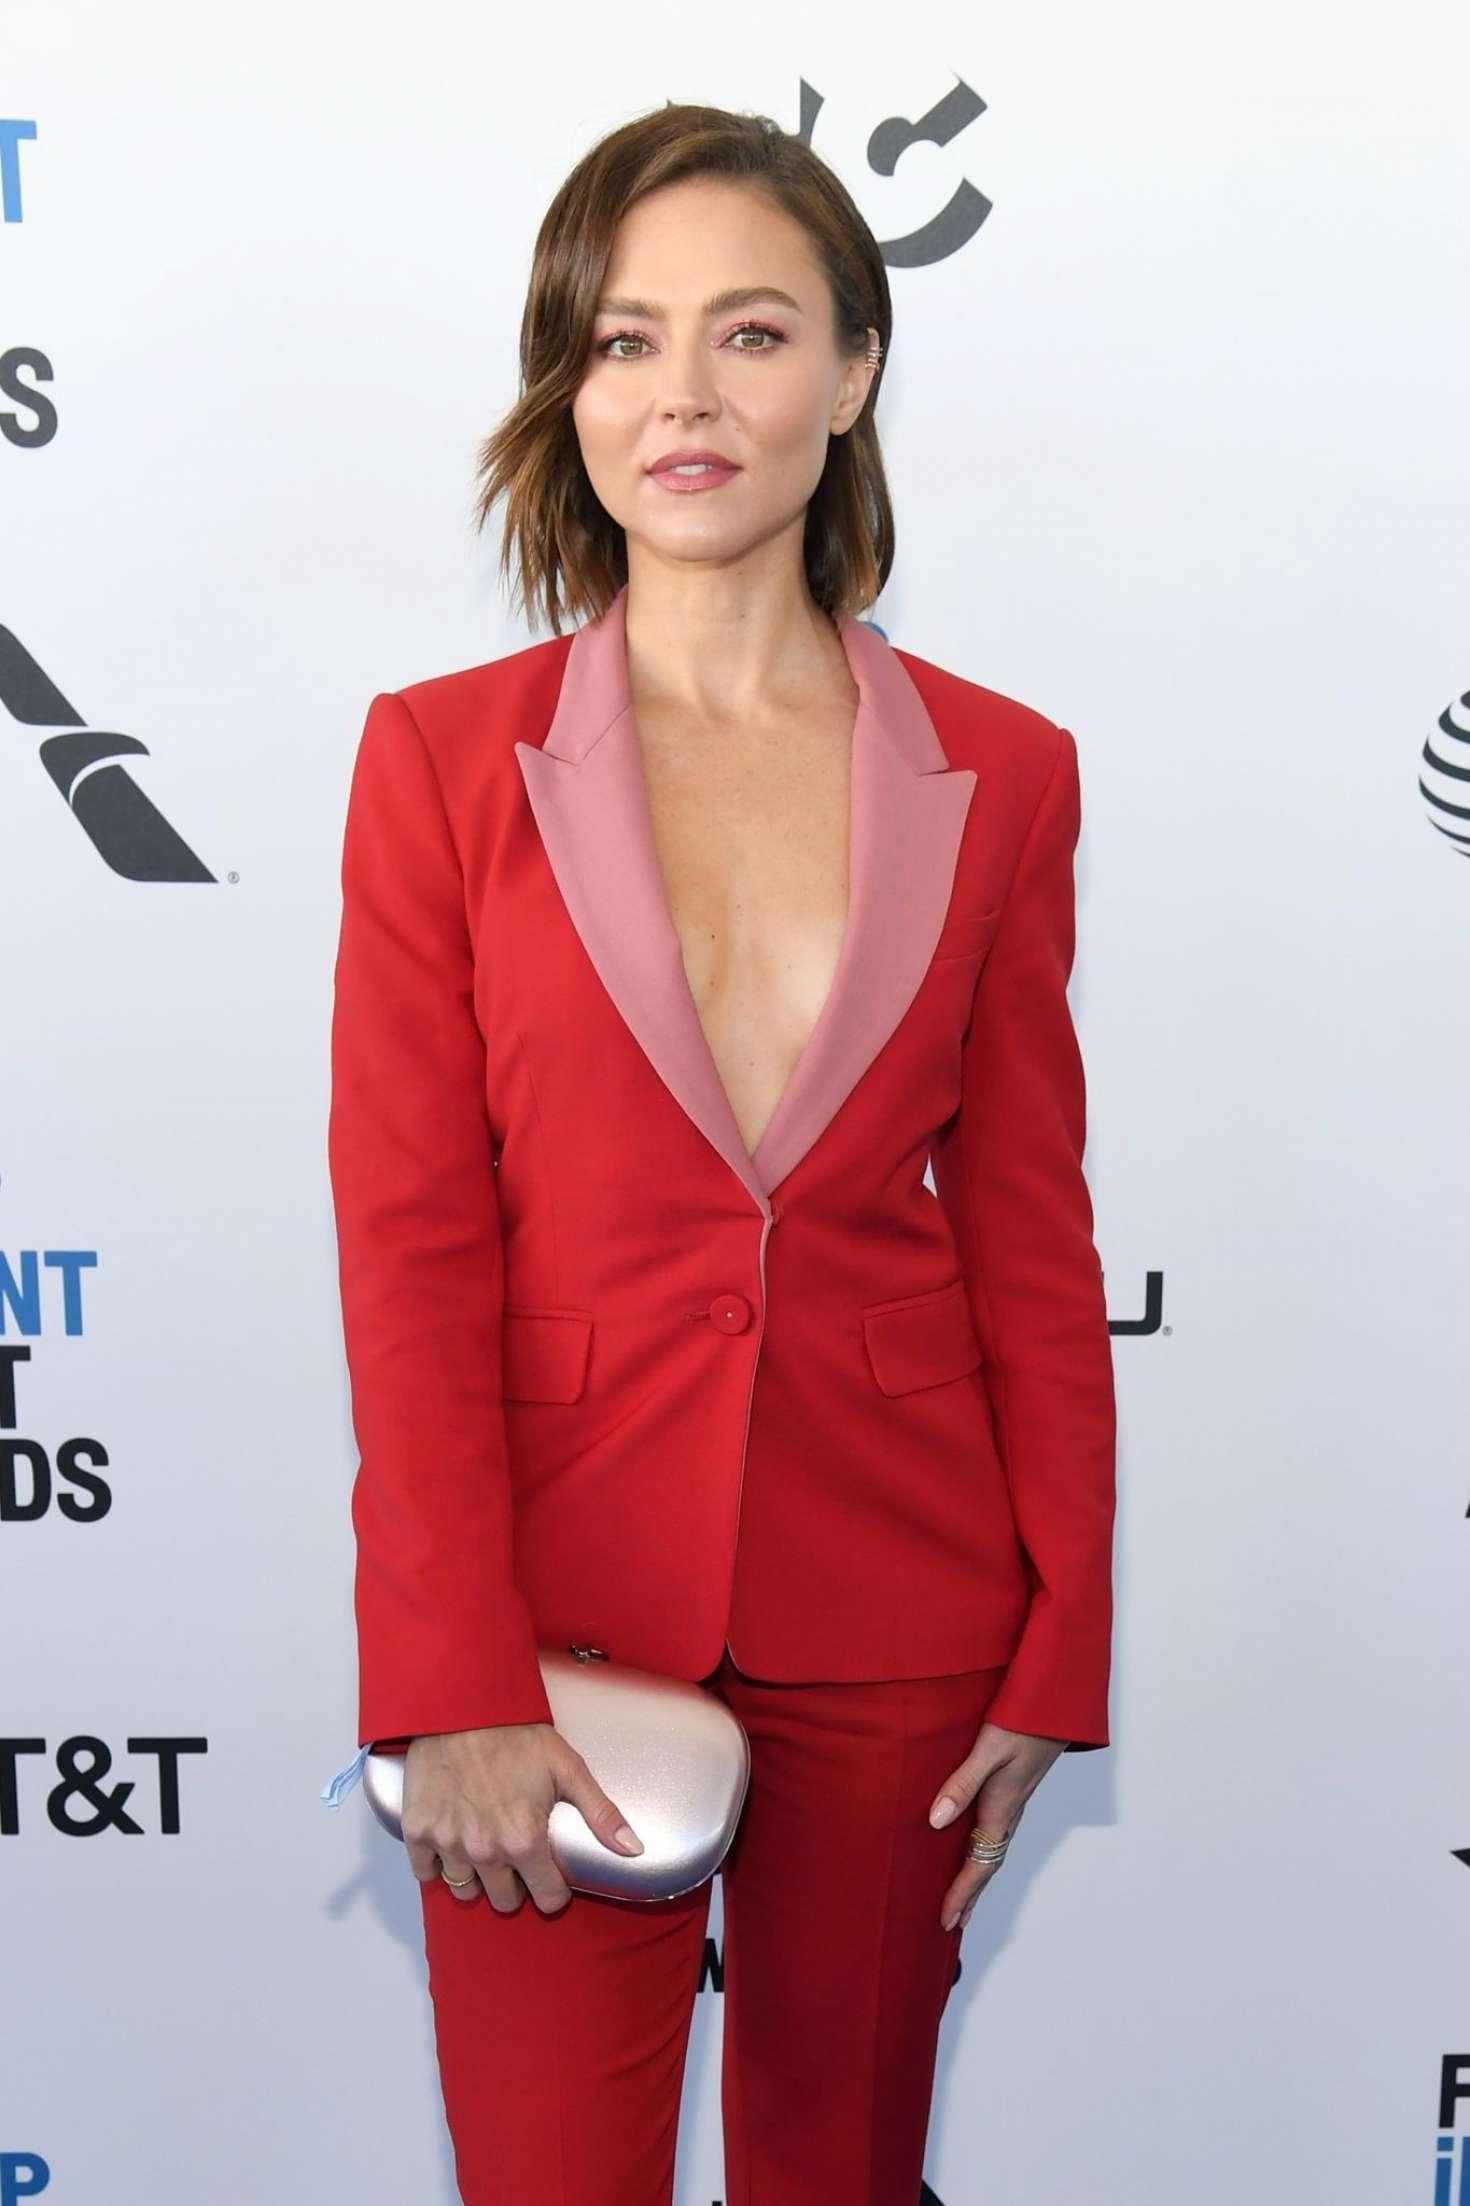 Trieste Kelly Dunn - 2019 Film Independent Spirit Awards in Santa Monica